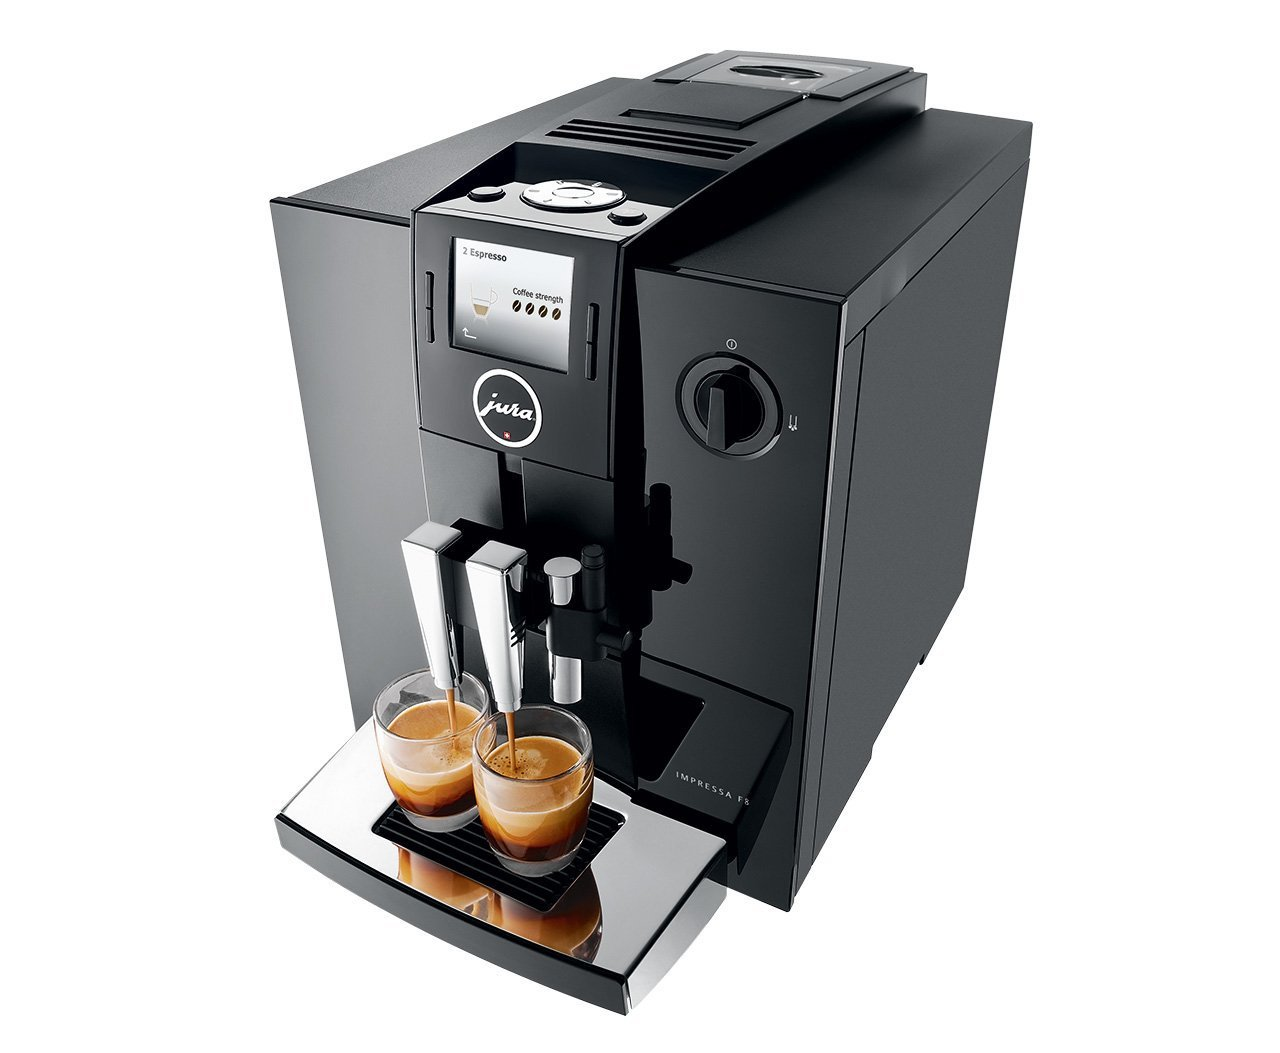 Jura 15025 Impressa F8 TFT Espresso Machine, Black, (Certified Refurbished)